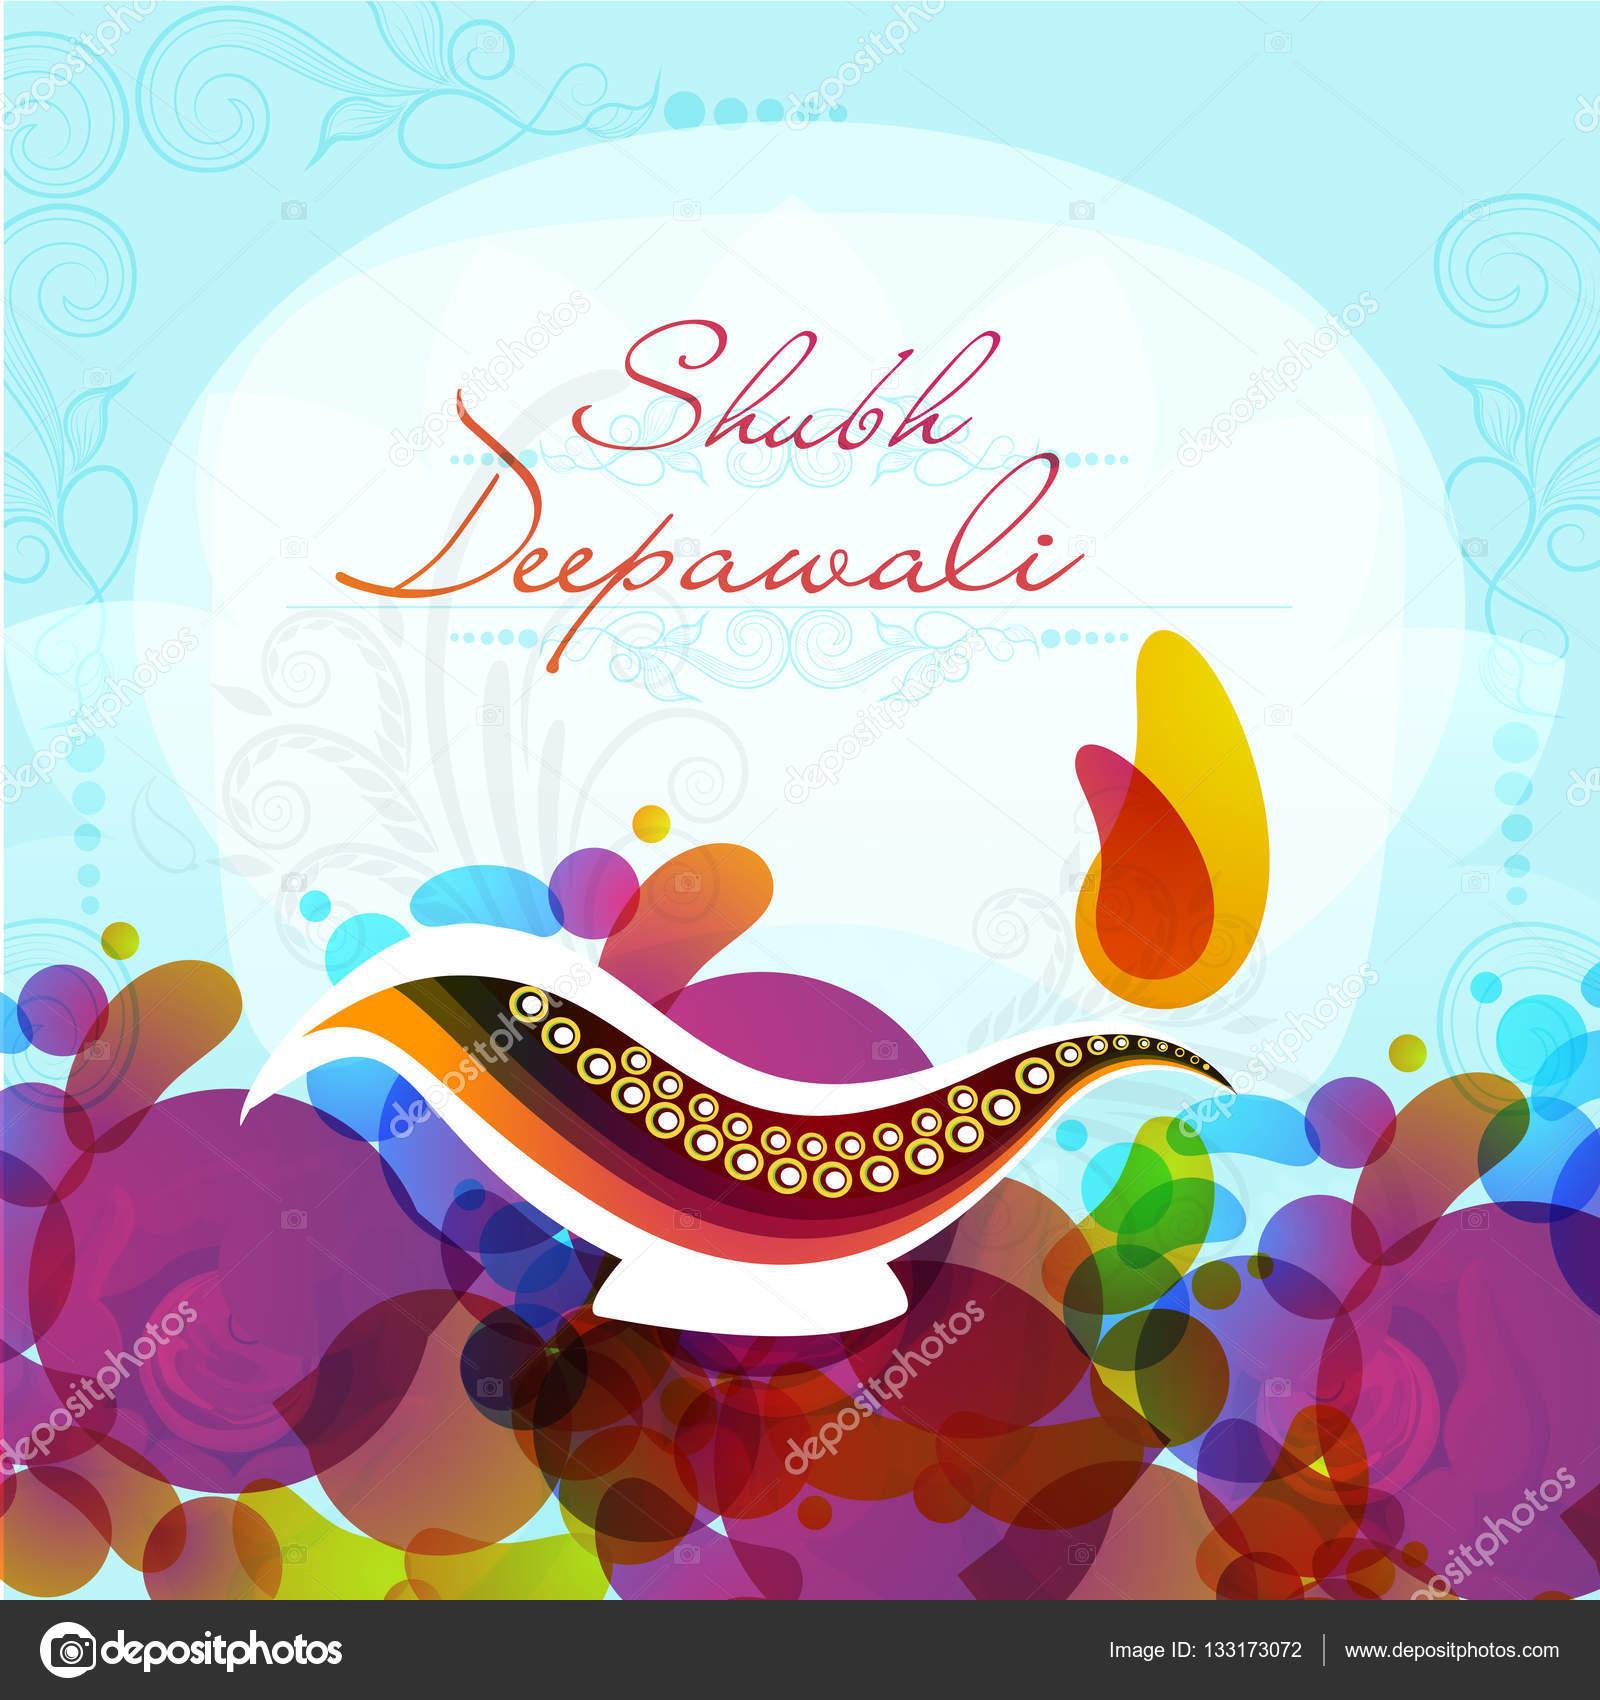 Greeting Card For Happy Diwali Celebration Stock Vector